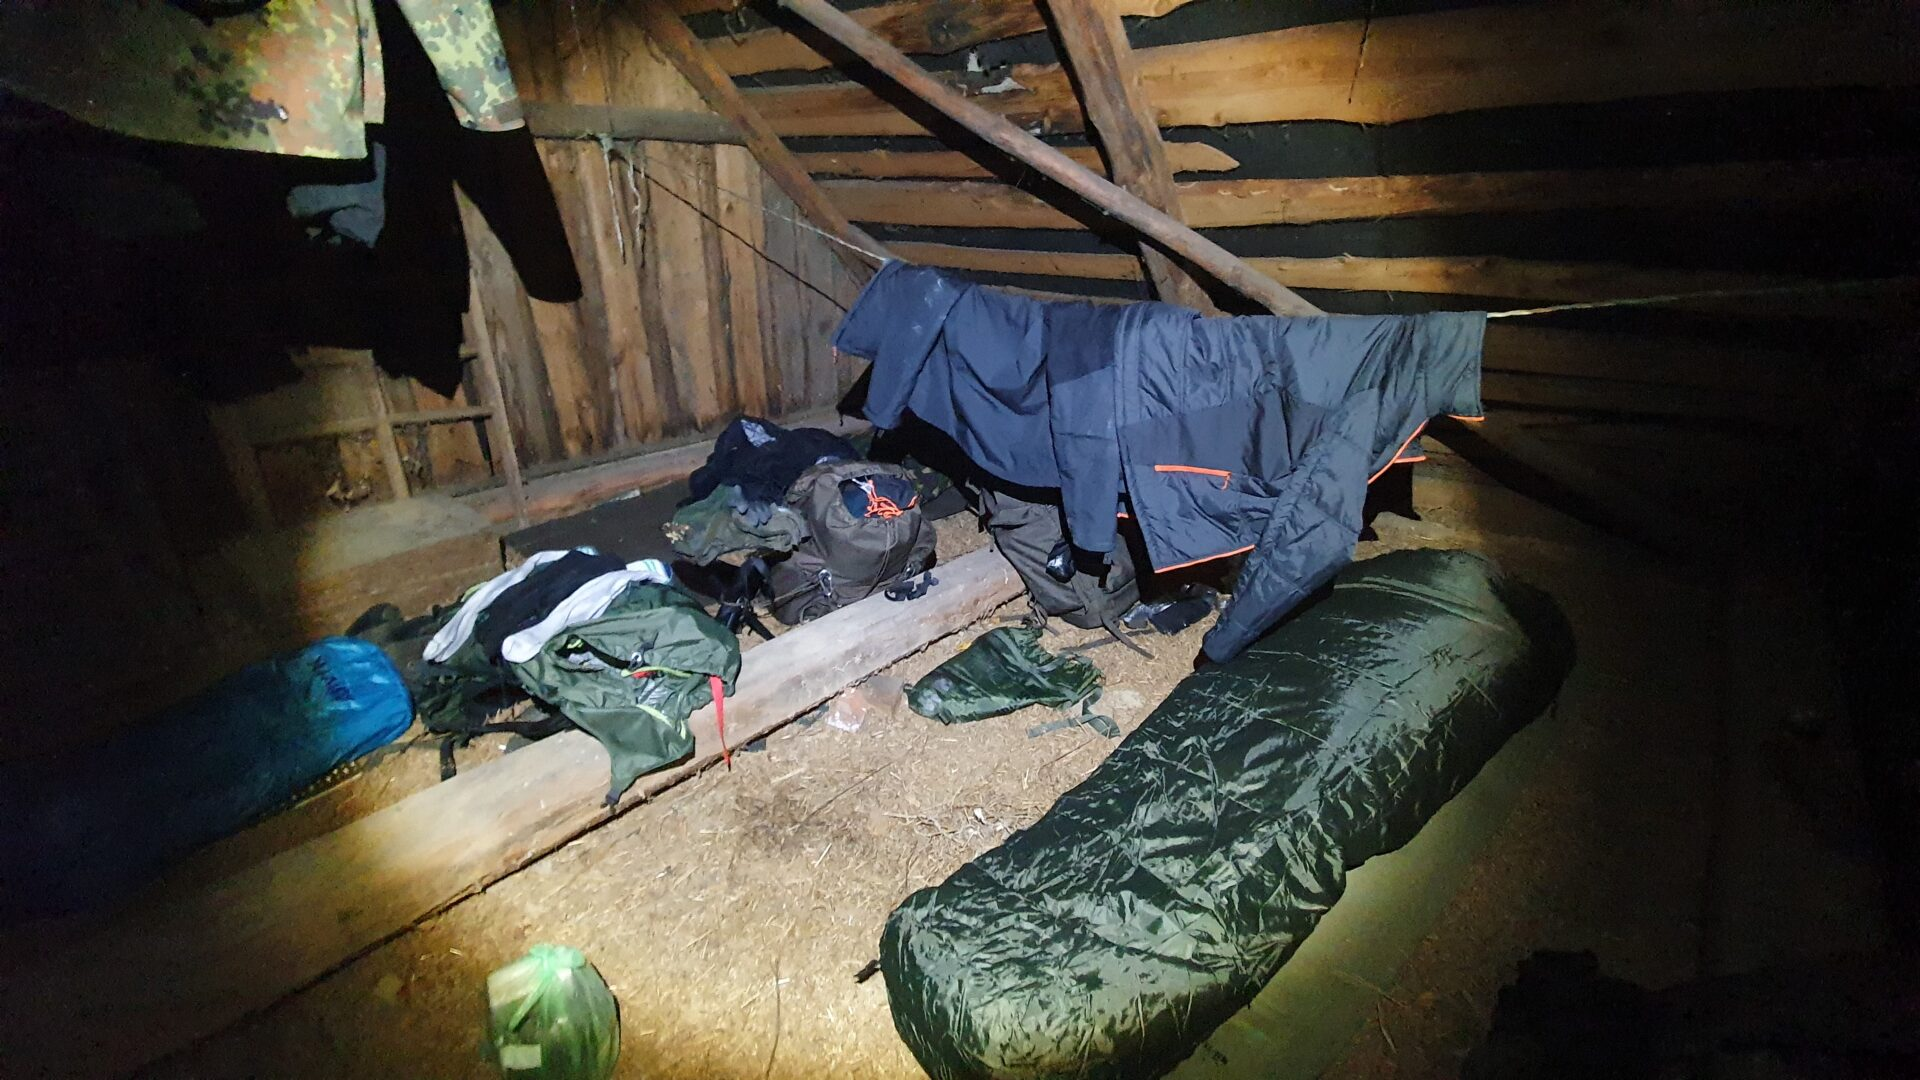 Sleeping place is set up. Good night.